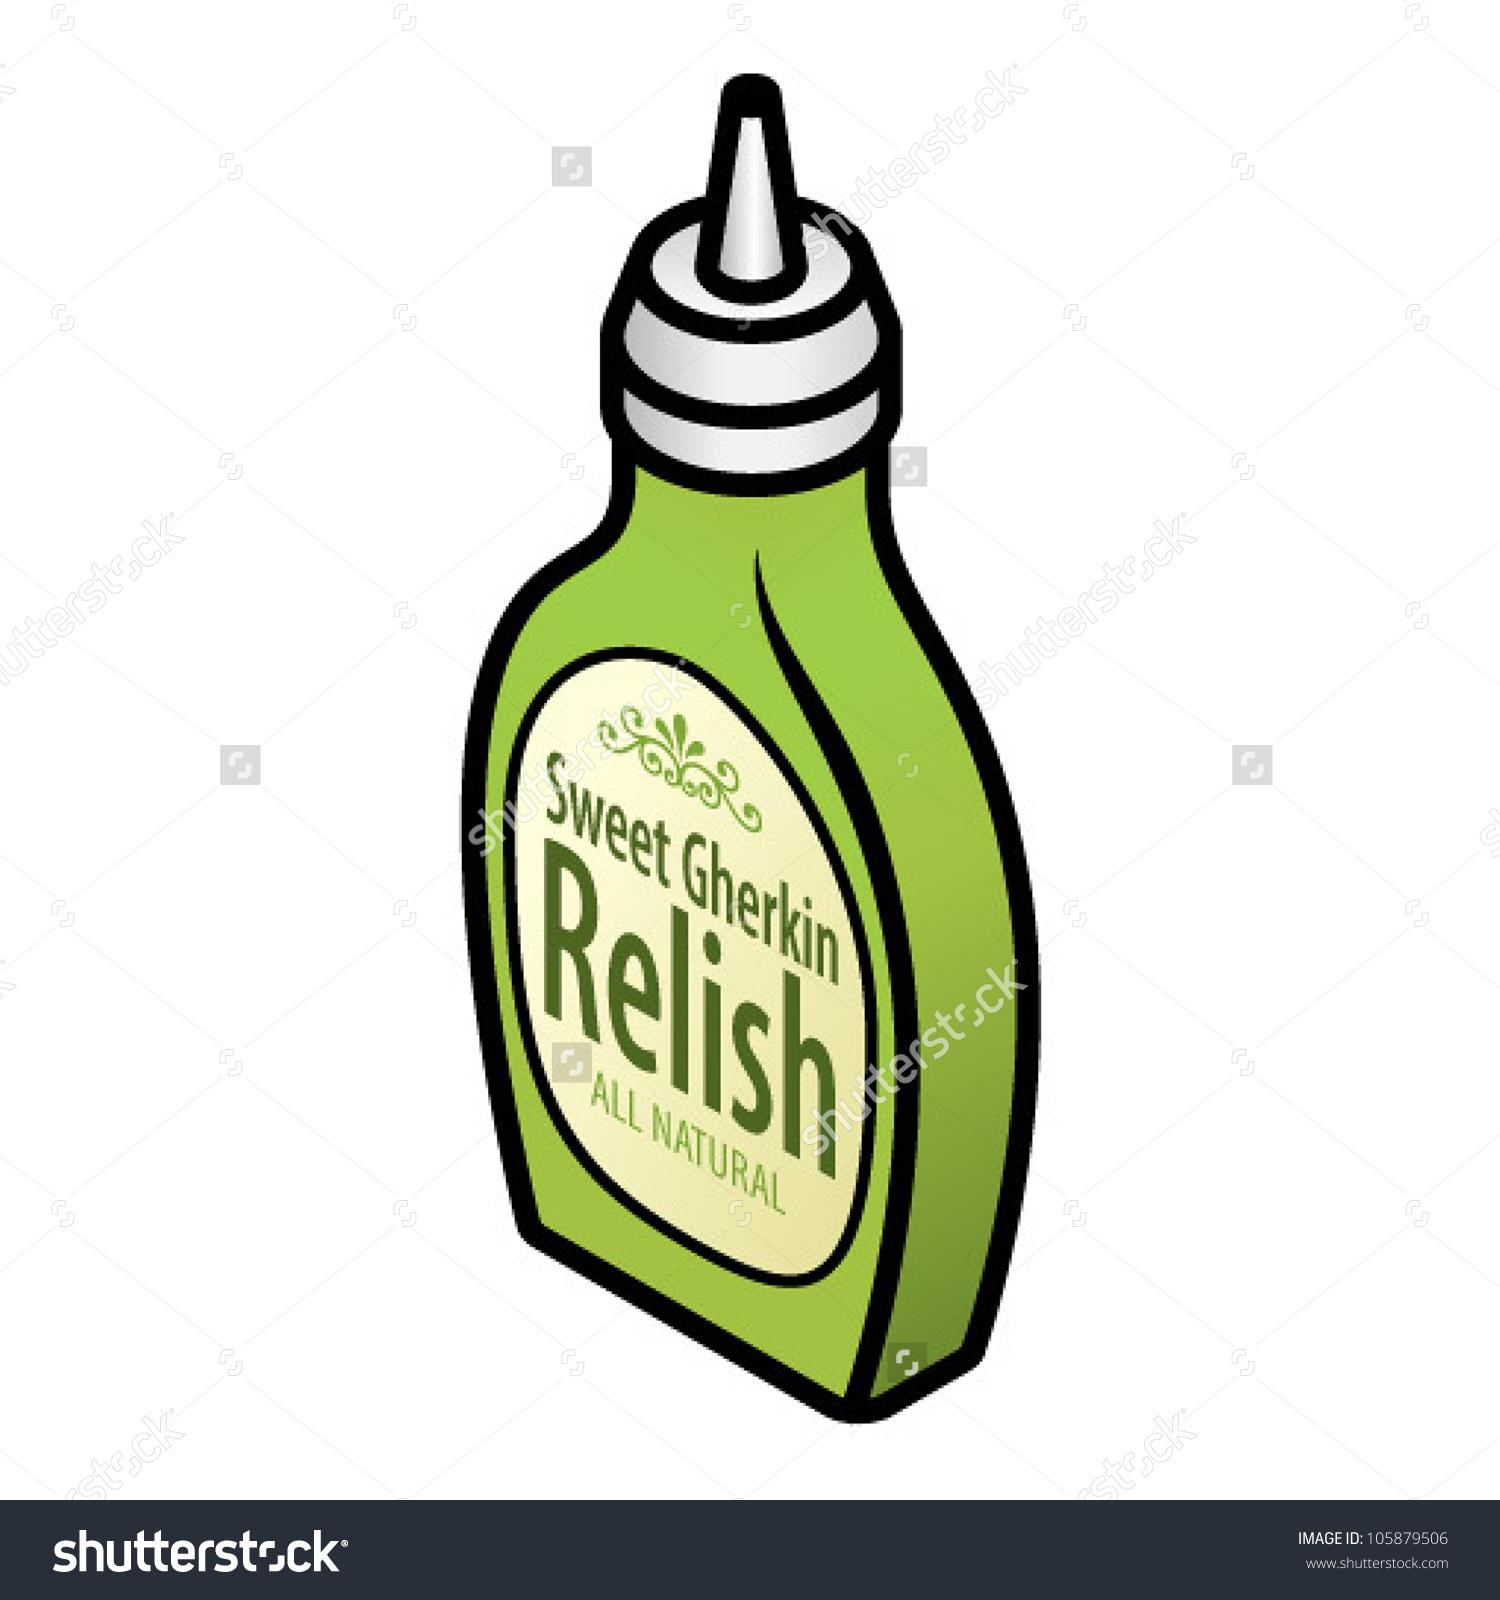 Relish clipart.